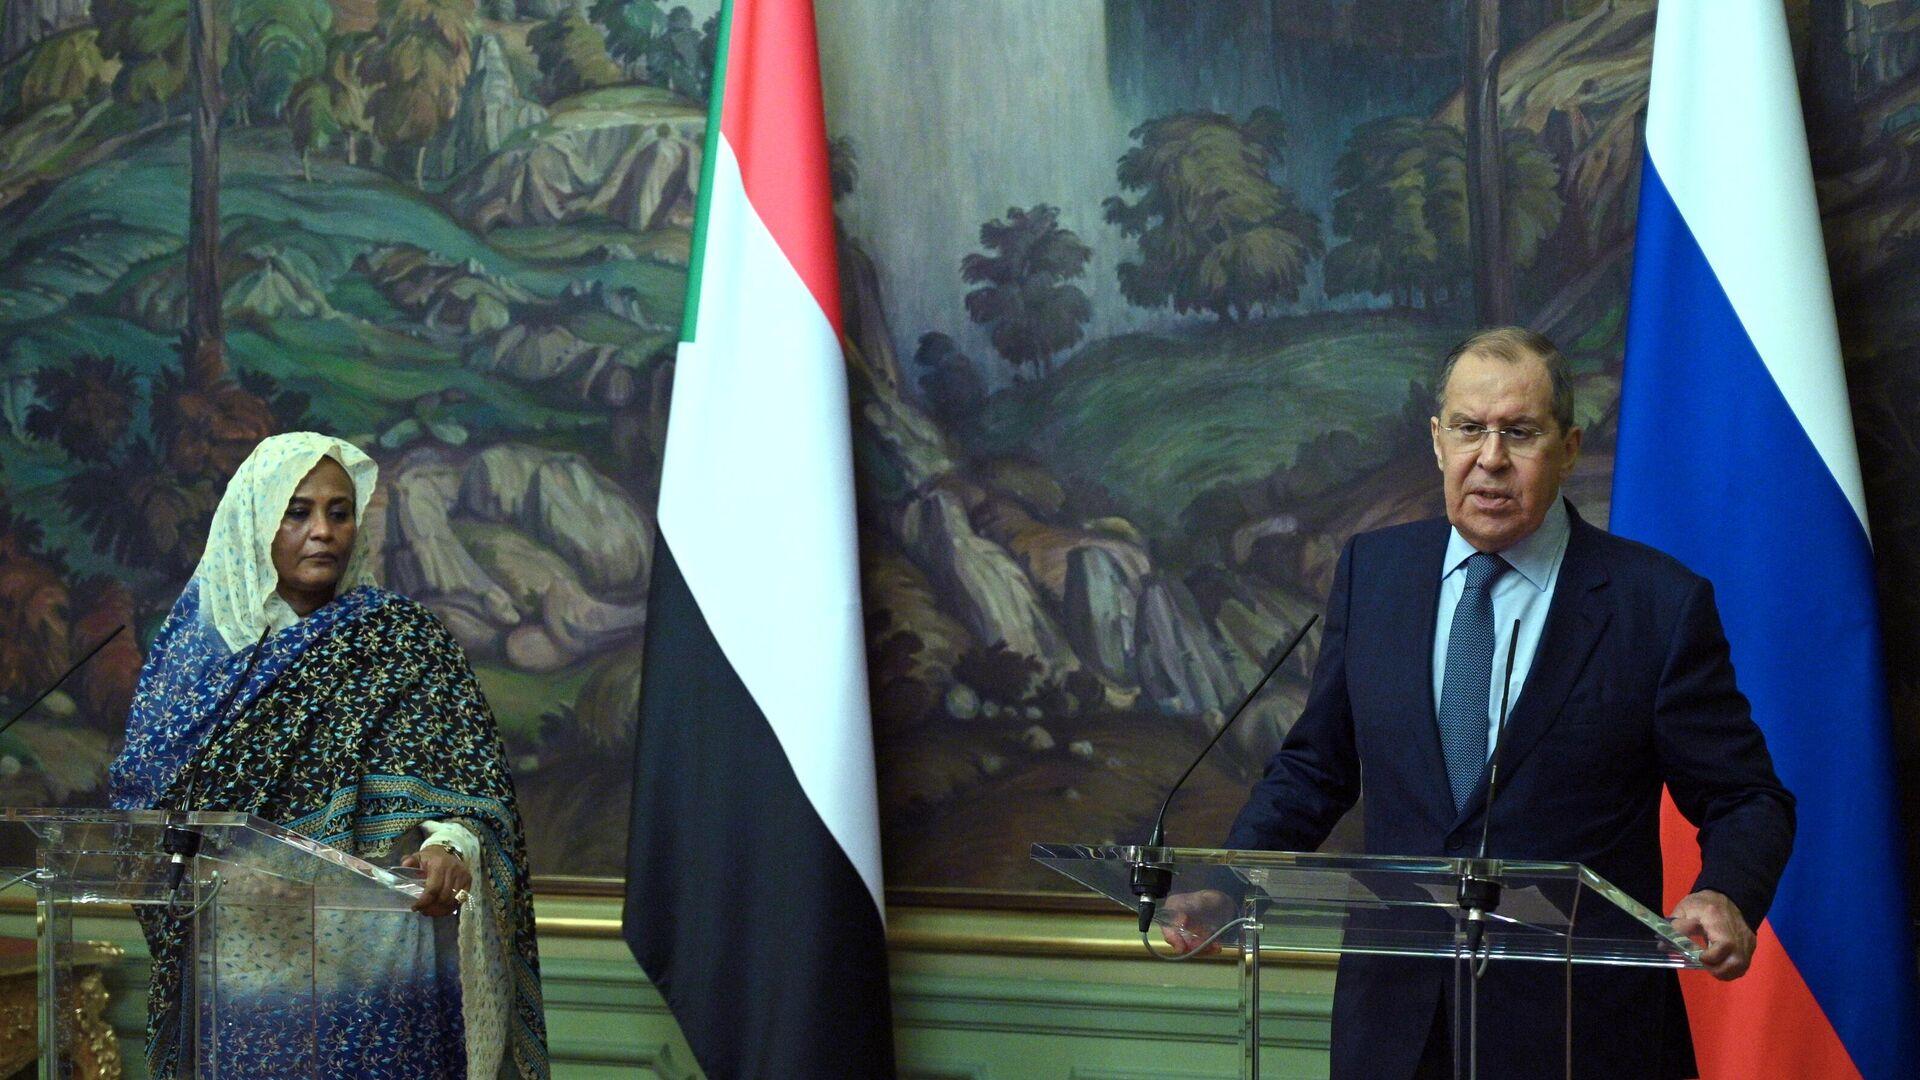 La canciller sudanesa Mariam al Sadiq al Mahdi, y su homólogo ruso Serguéi Lavrov - Sputnik Mundo, 1920, 12.07.2021